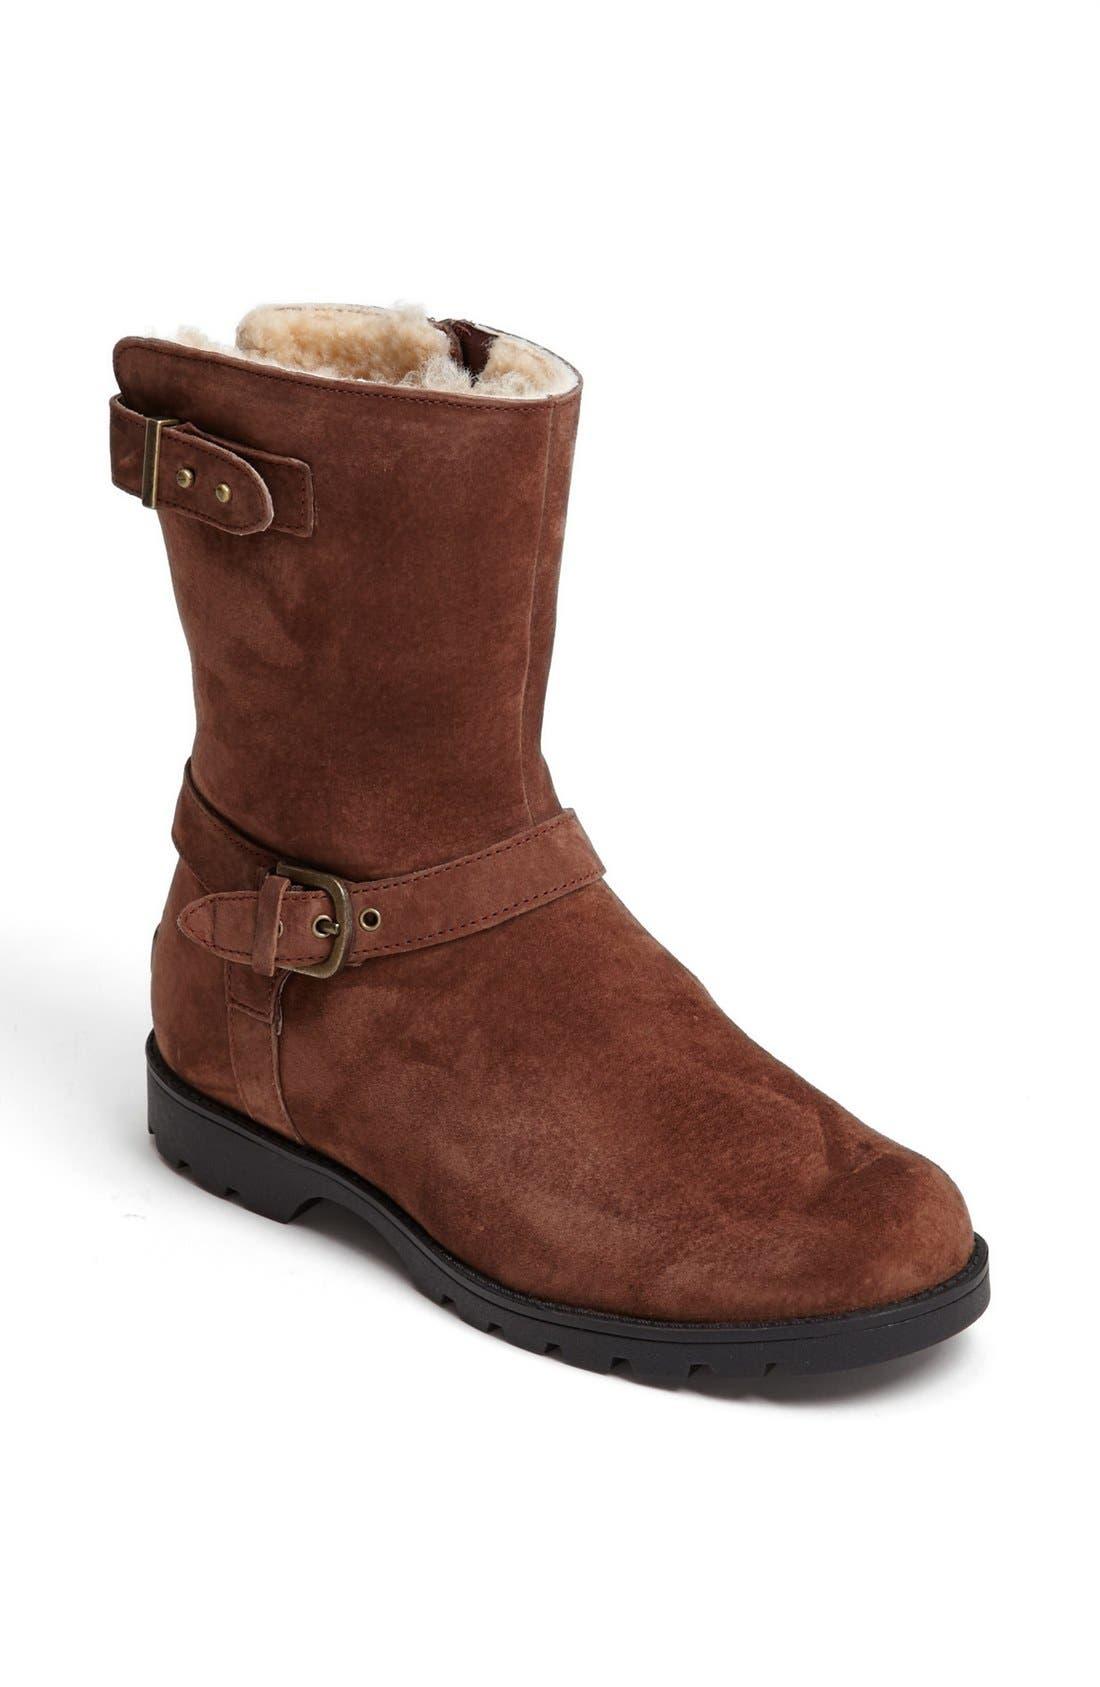 Alternate Image 1 Selected - UGG® Australia 'Grandle' Boot (Women)